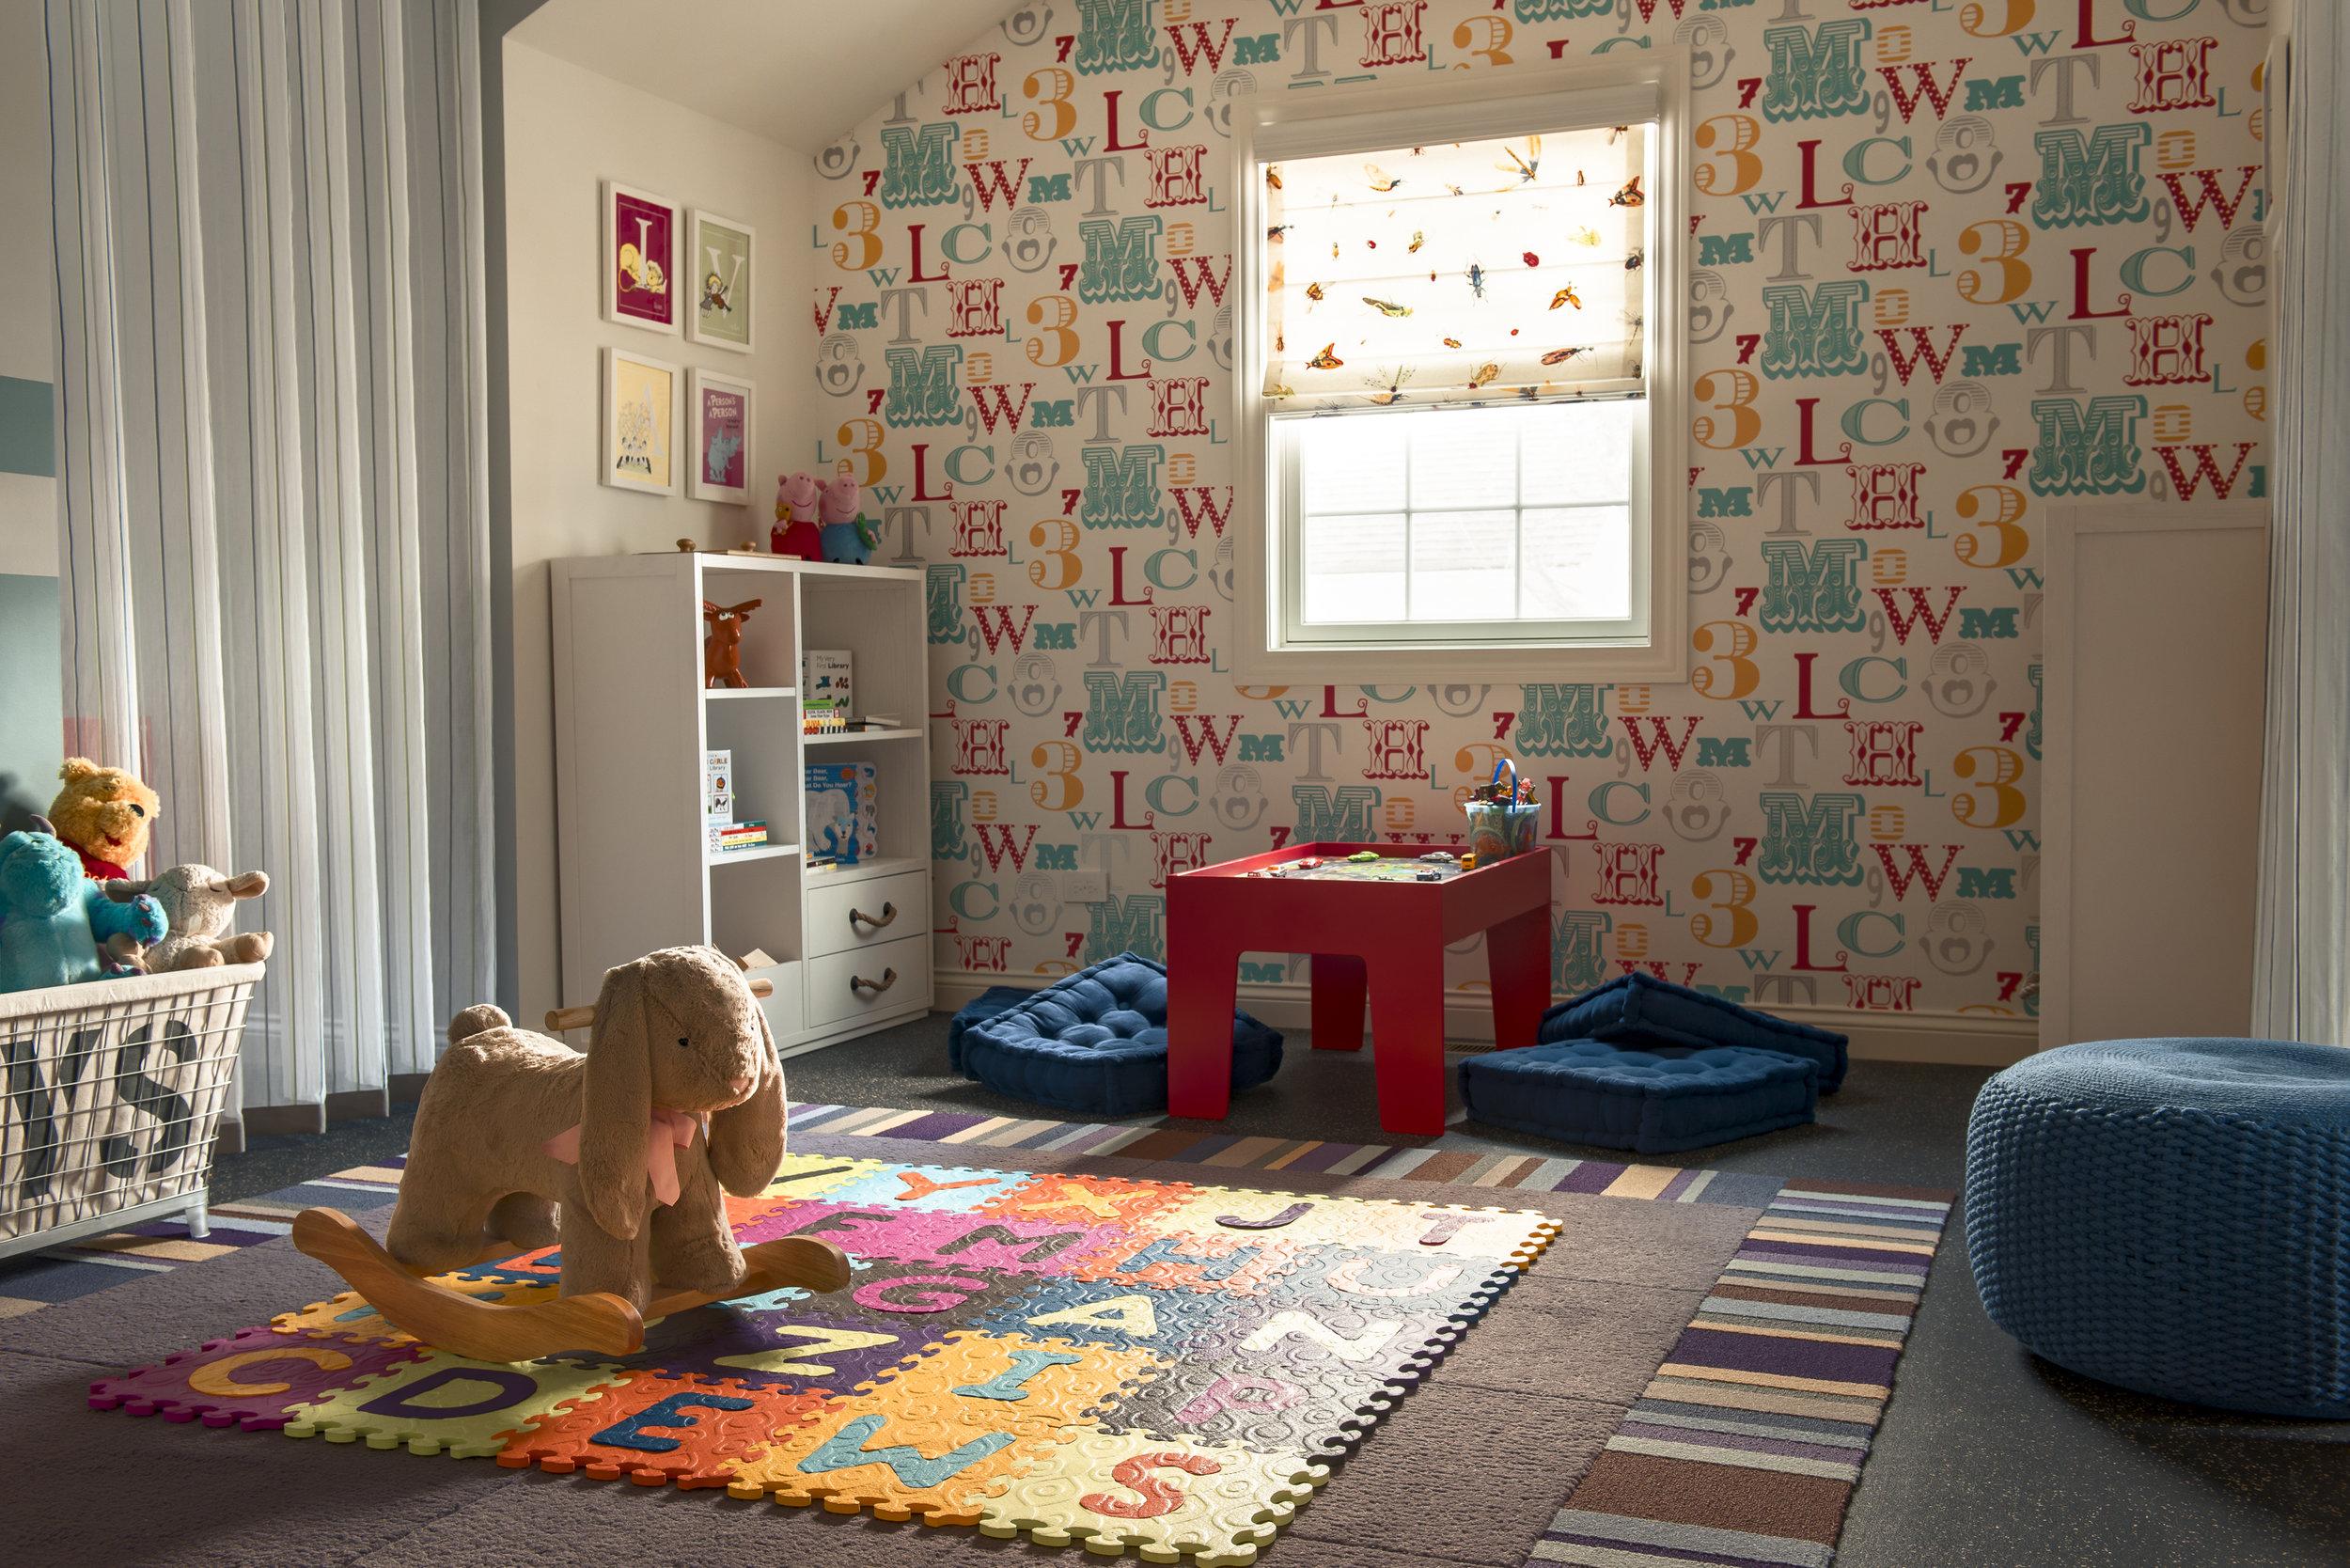 161208_Job#124_LauraMetcalfe_OutlineInteriors_Playroom_3000px_1397-2.jpg